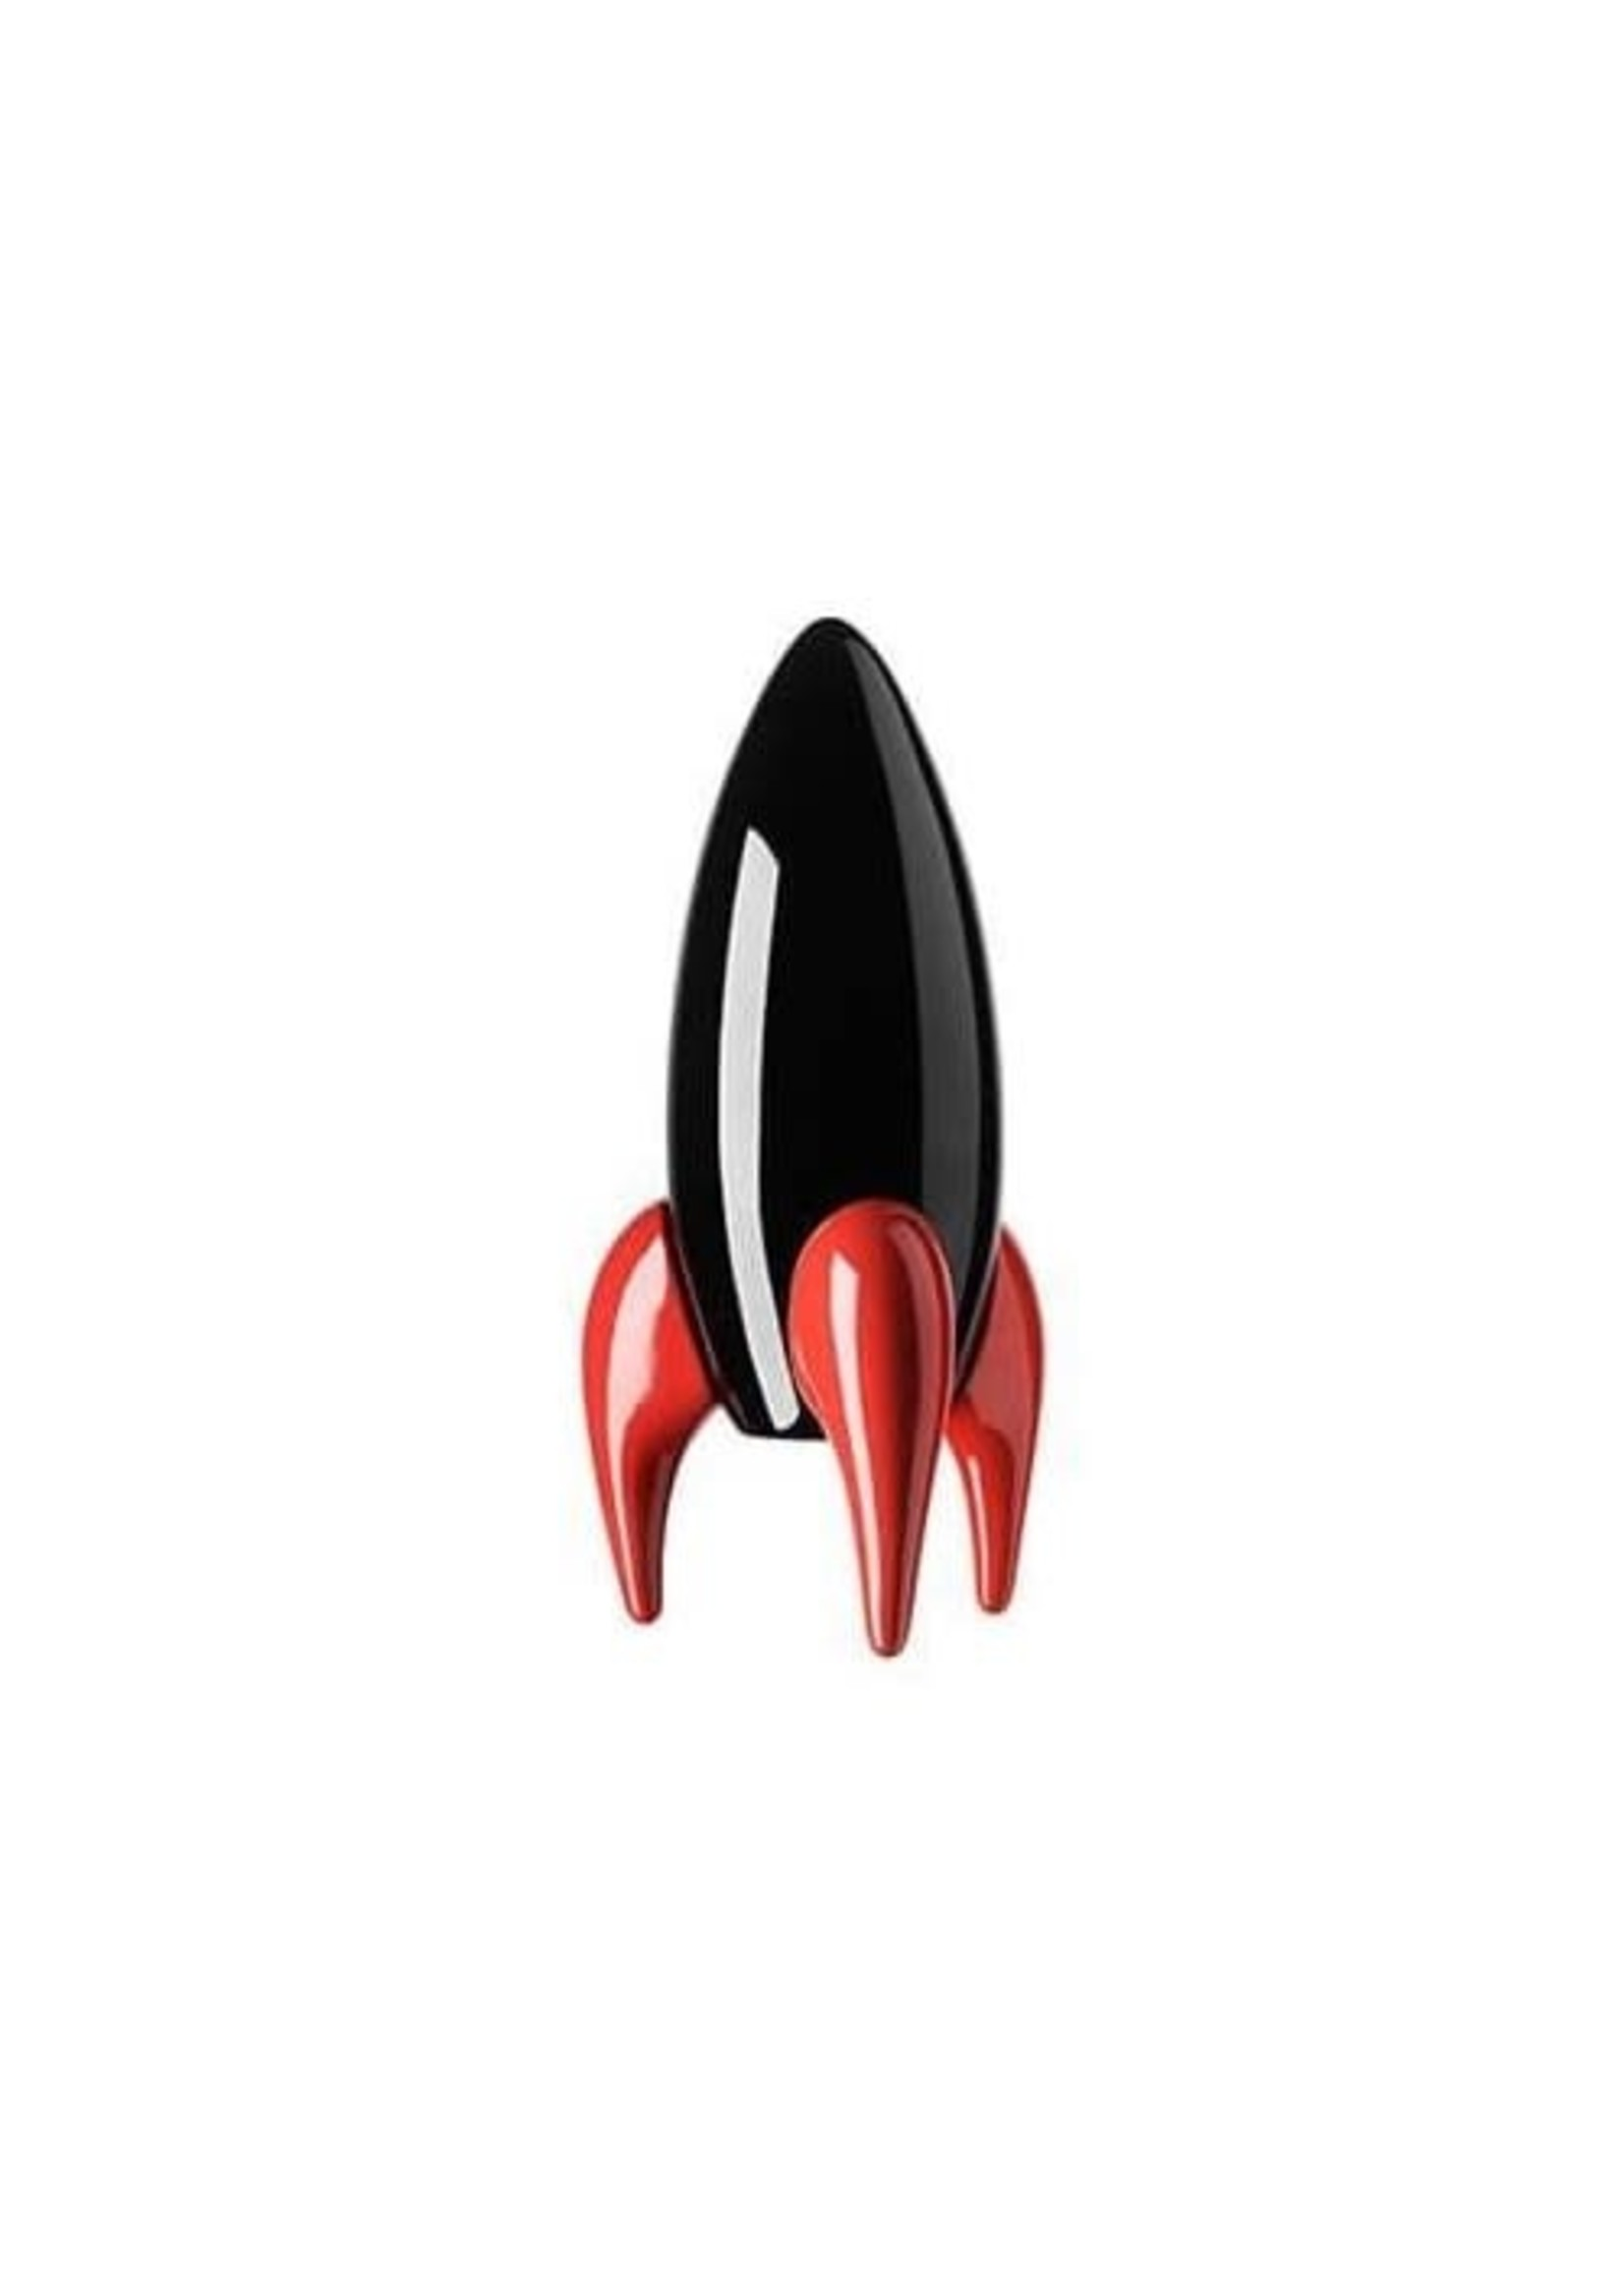 Playsam Playsam Rocket Black/Red